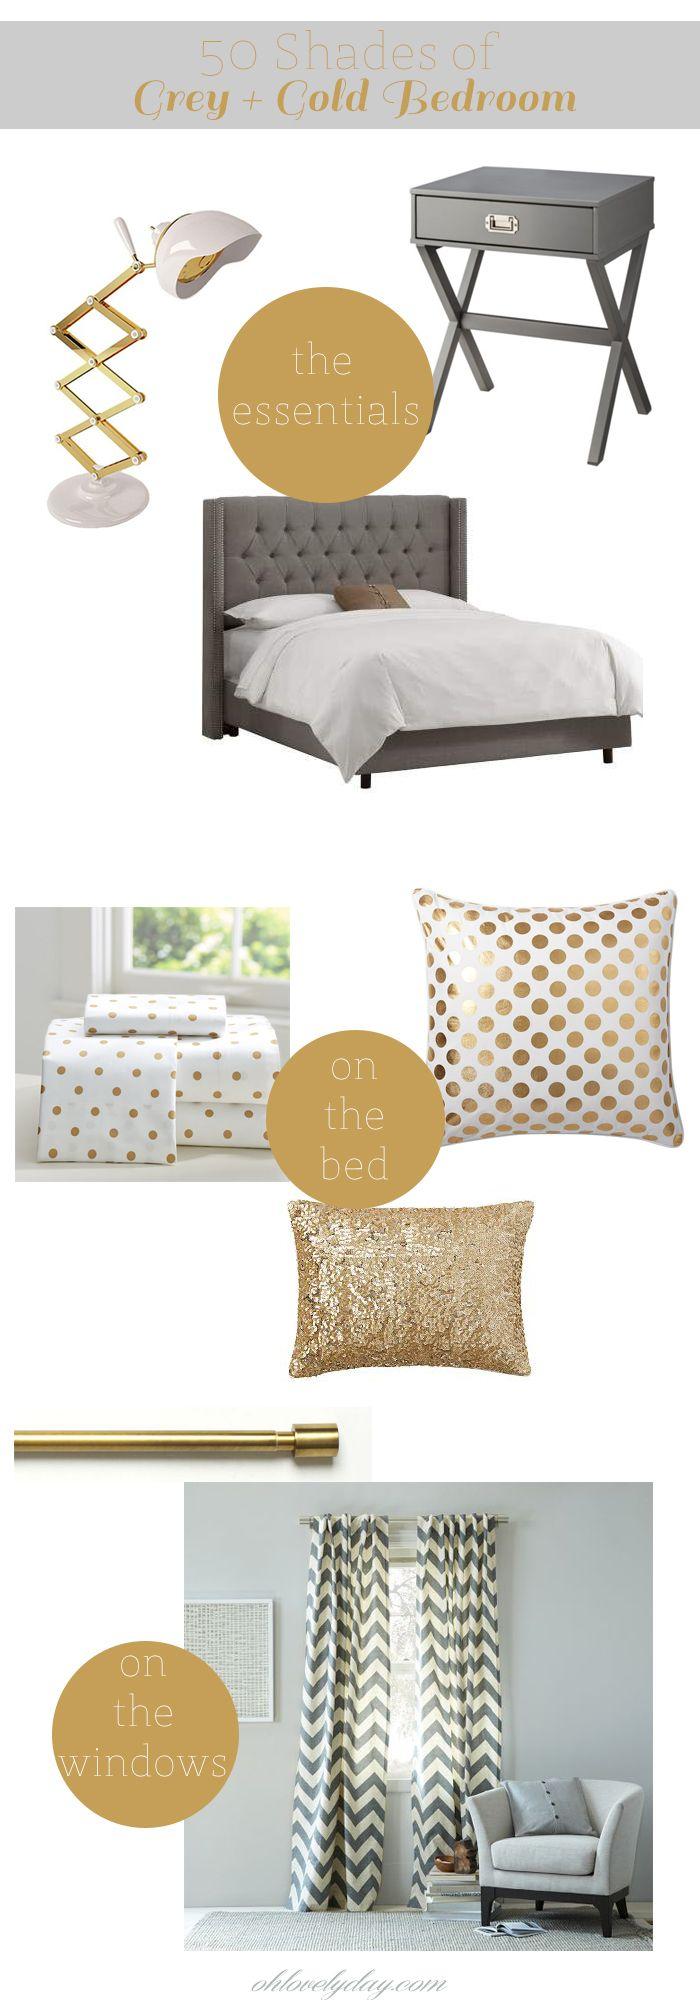 grey gold bedroom inspiration